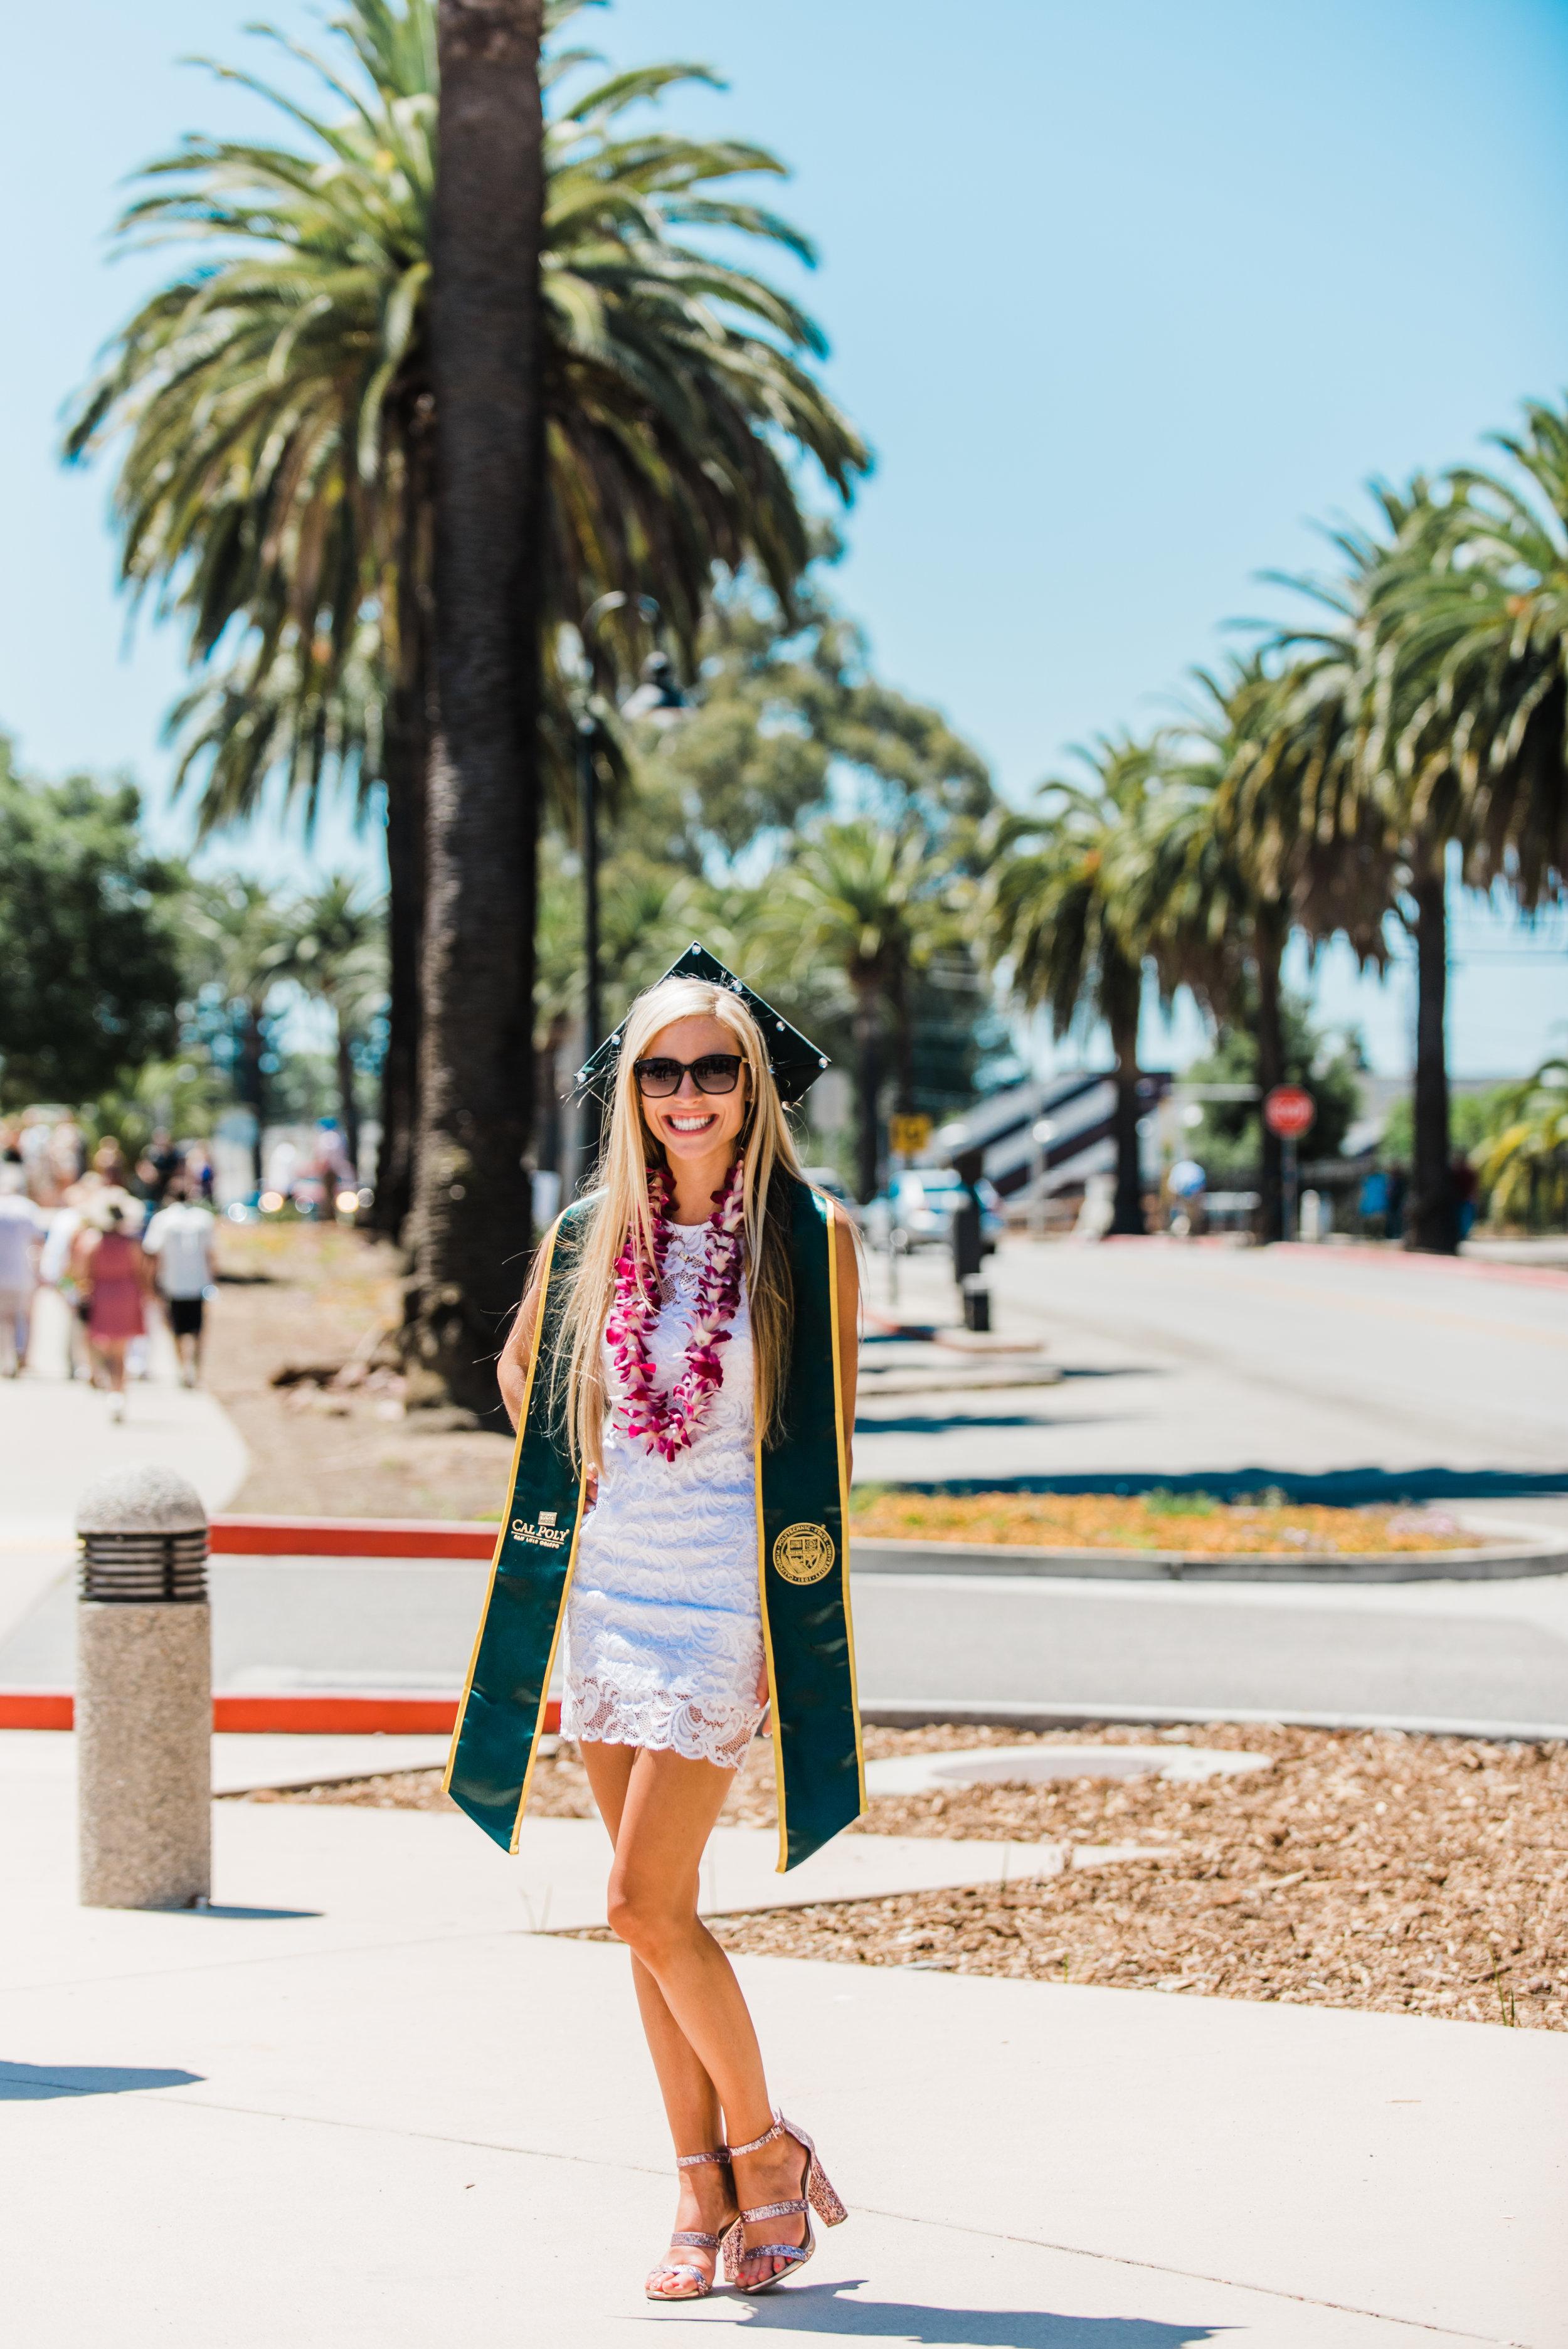 Cal poly graduate